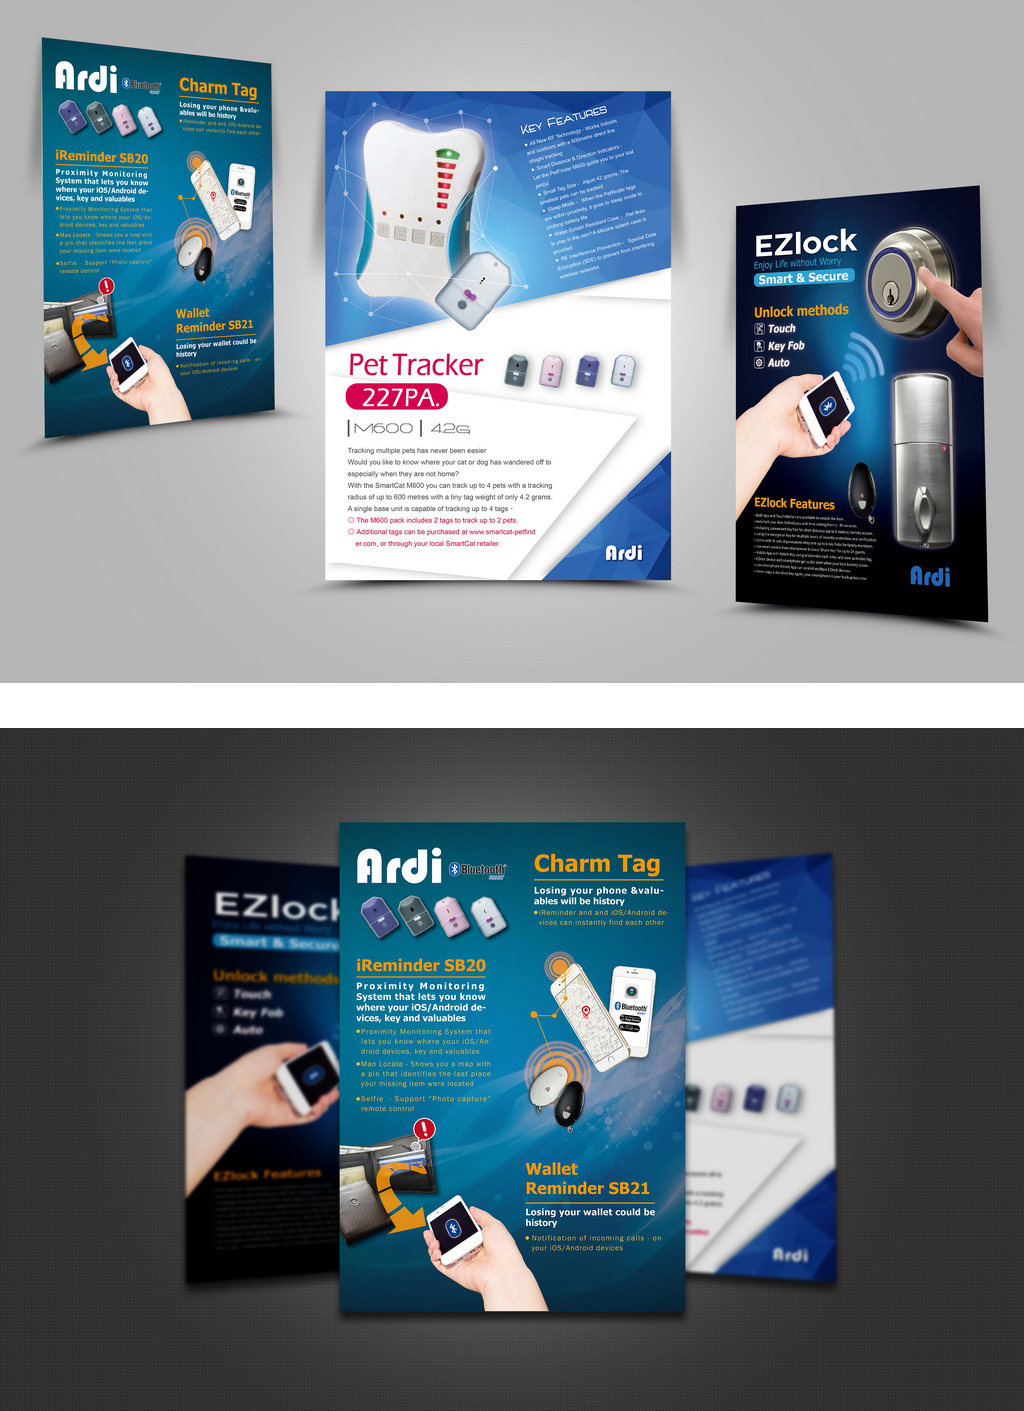 ARDI雅帝科技,展覽用海報設計